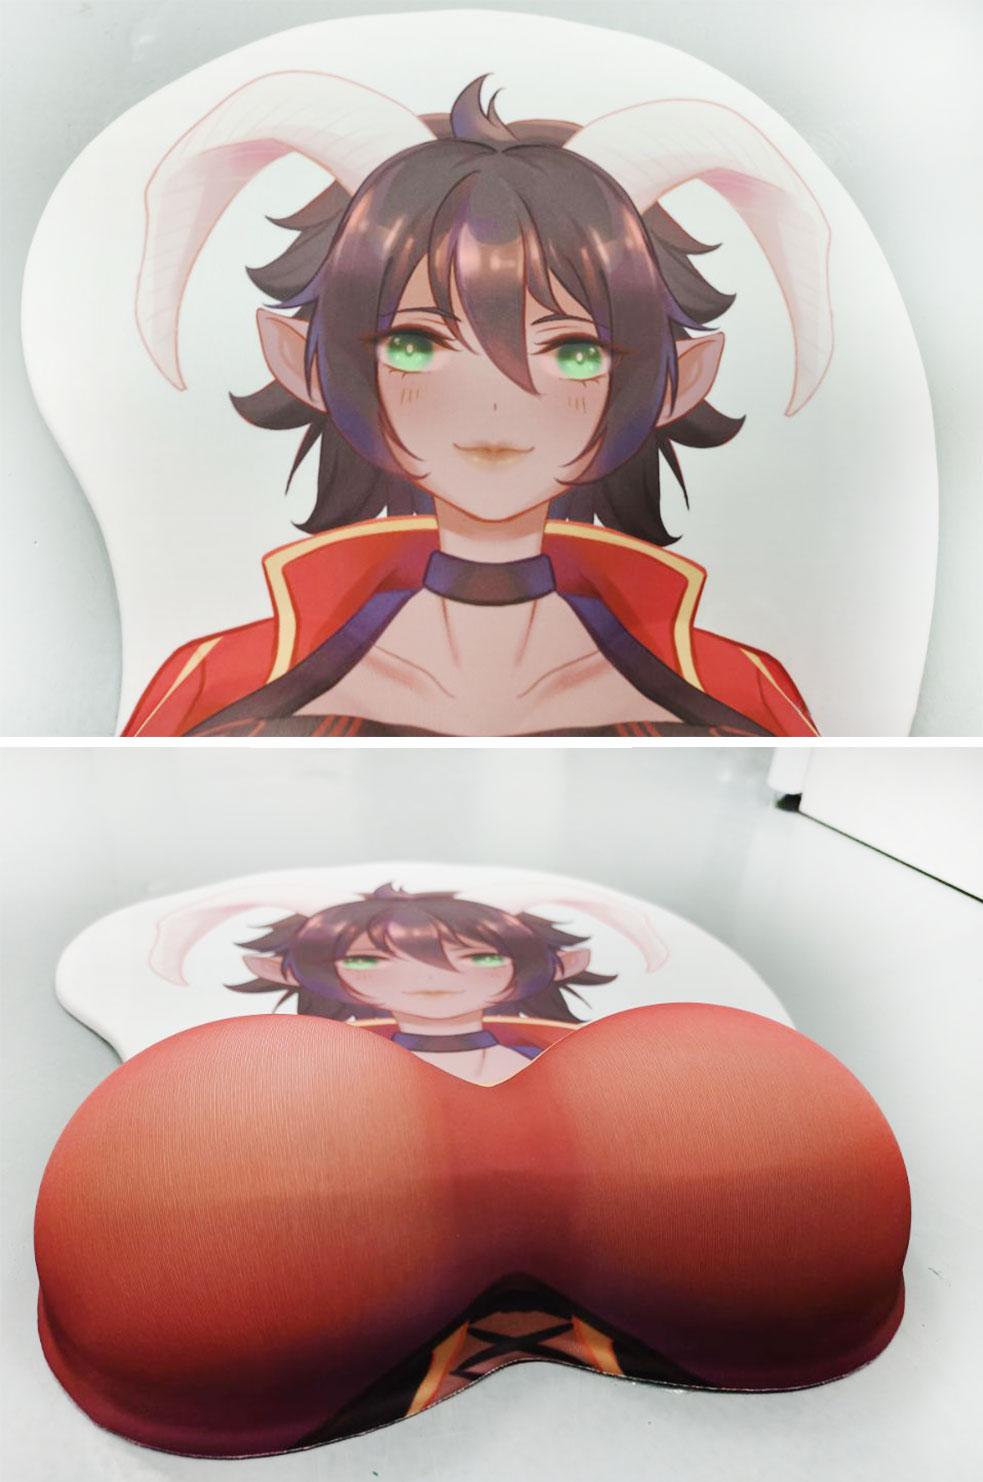 kda ahri life size oppai mousepad 2768 - Anime Mousepads